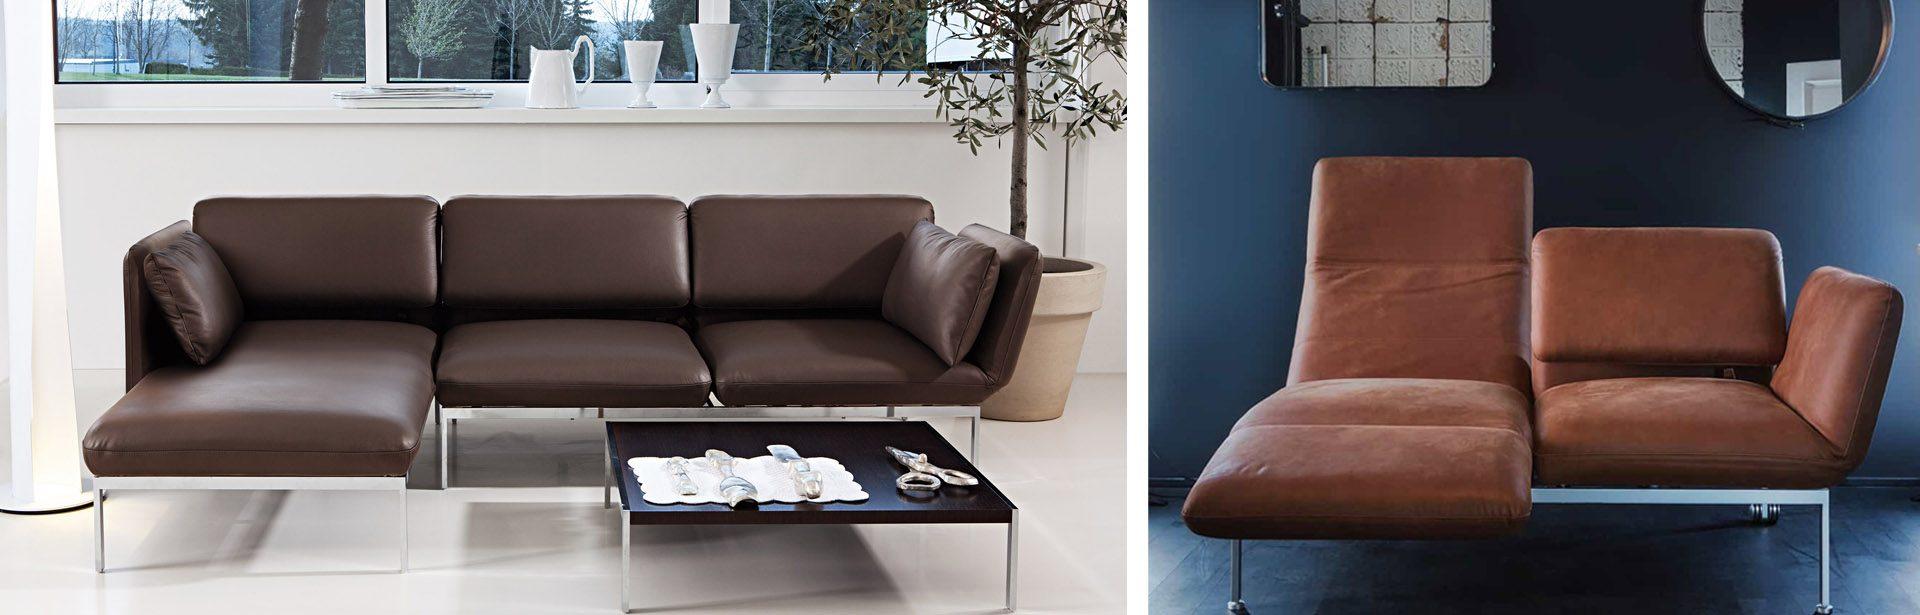 das original seit 1998 sofa roro von br hl. Black Bedroom Furniture Sets. Home Design Ideas